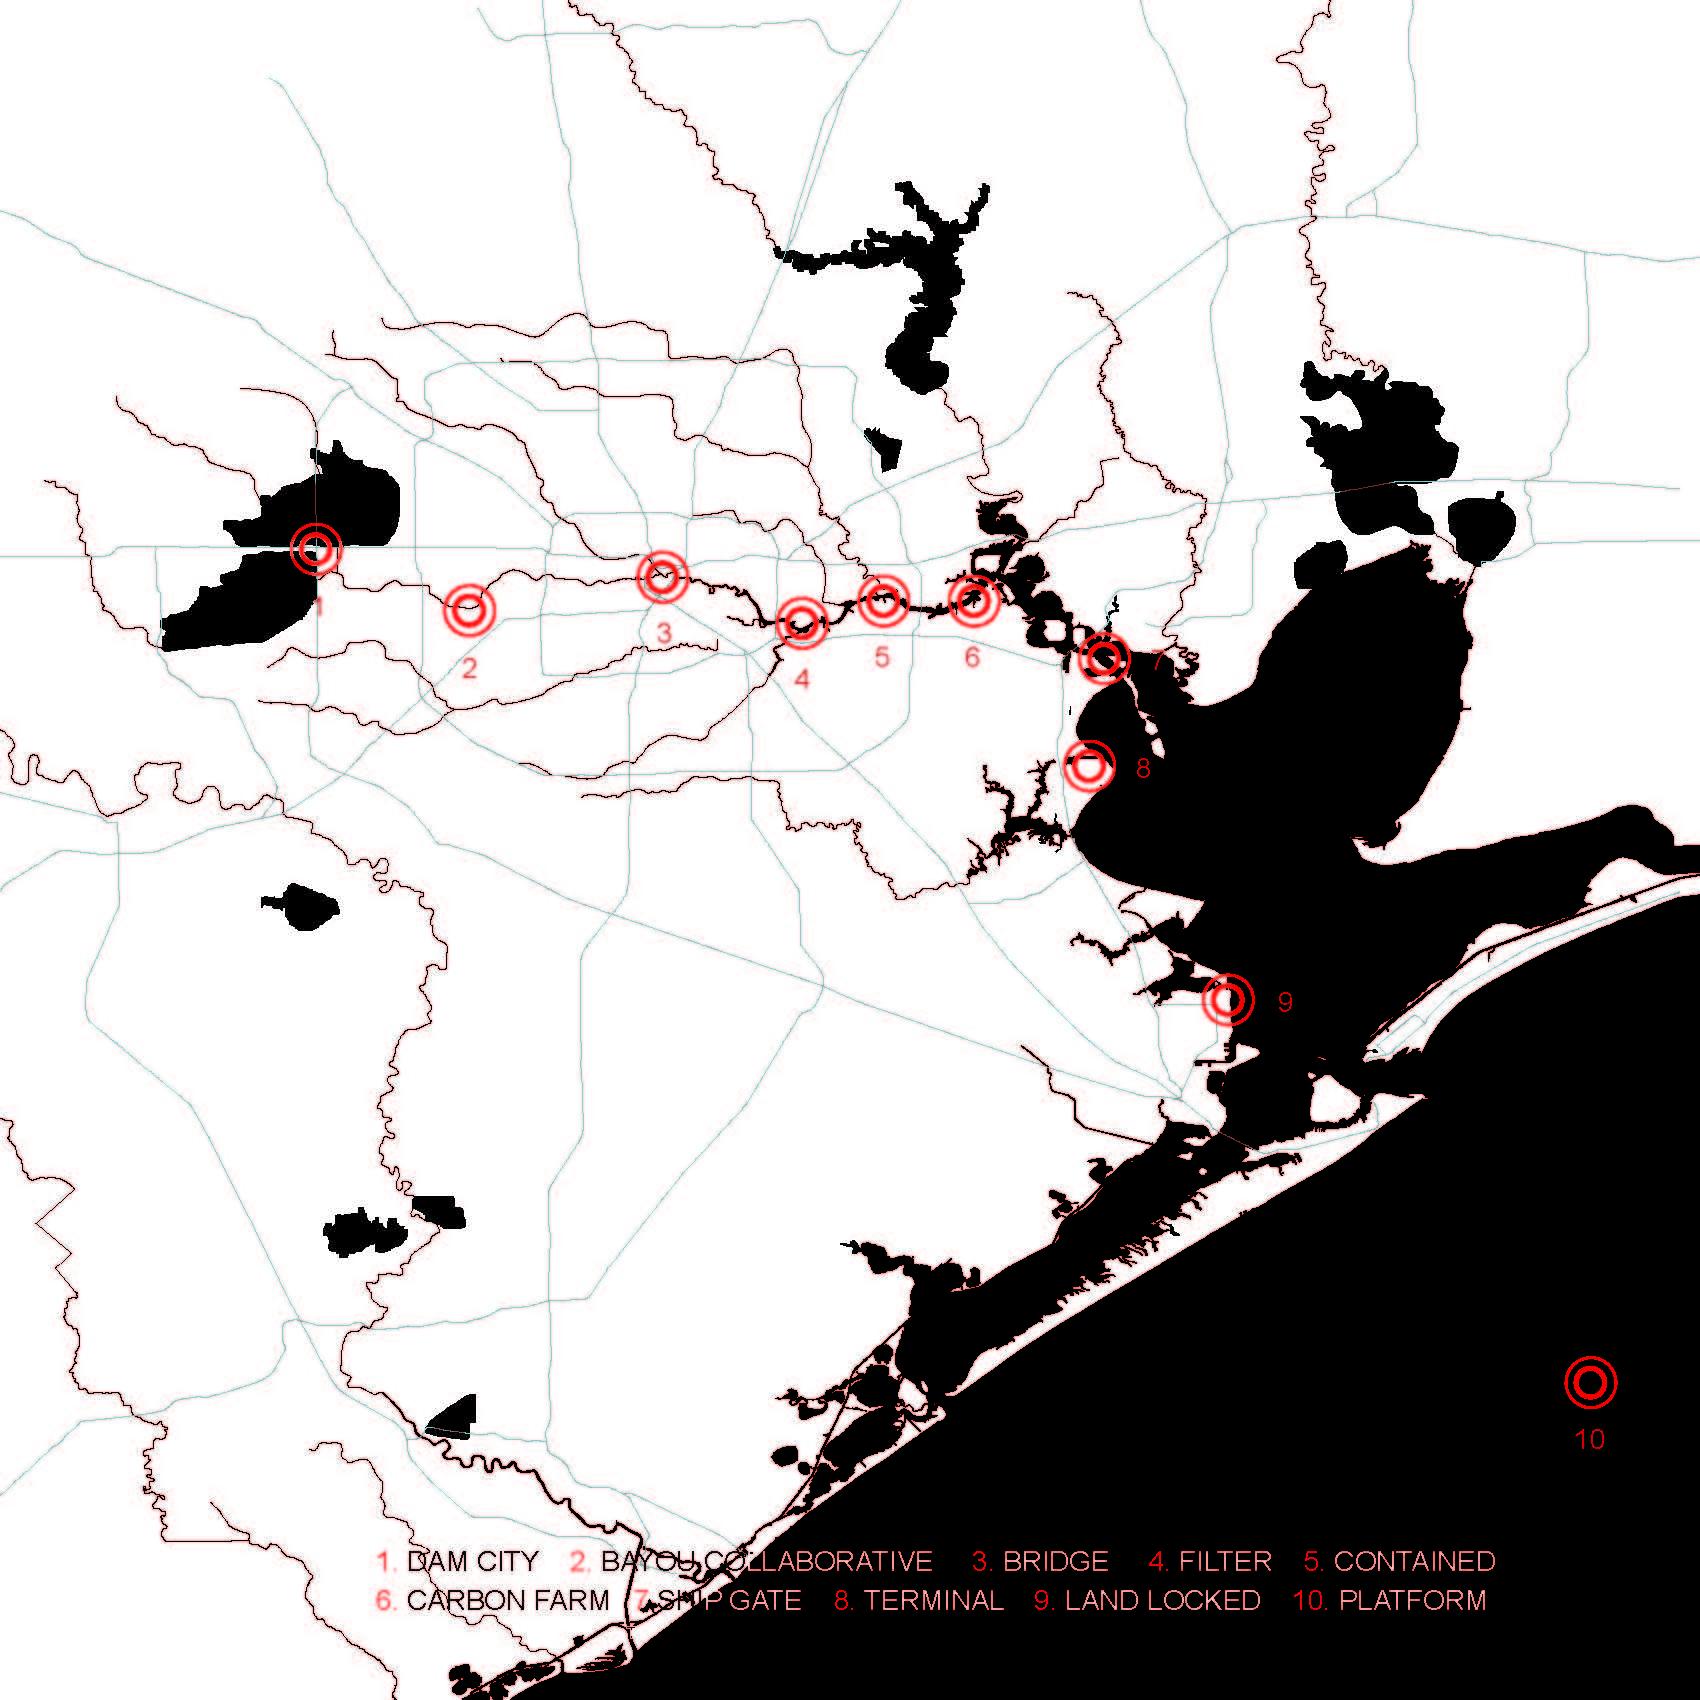 Gallery of A Walk Along the Bayou: An Award-Winning Proposal ... on ro map, cal state fullerton map, university of hawaii map, uz map, fa map, rice university parking map, the kentucky map, u of h campus map, fsu college map, uq map,